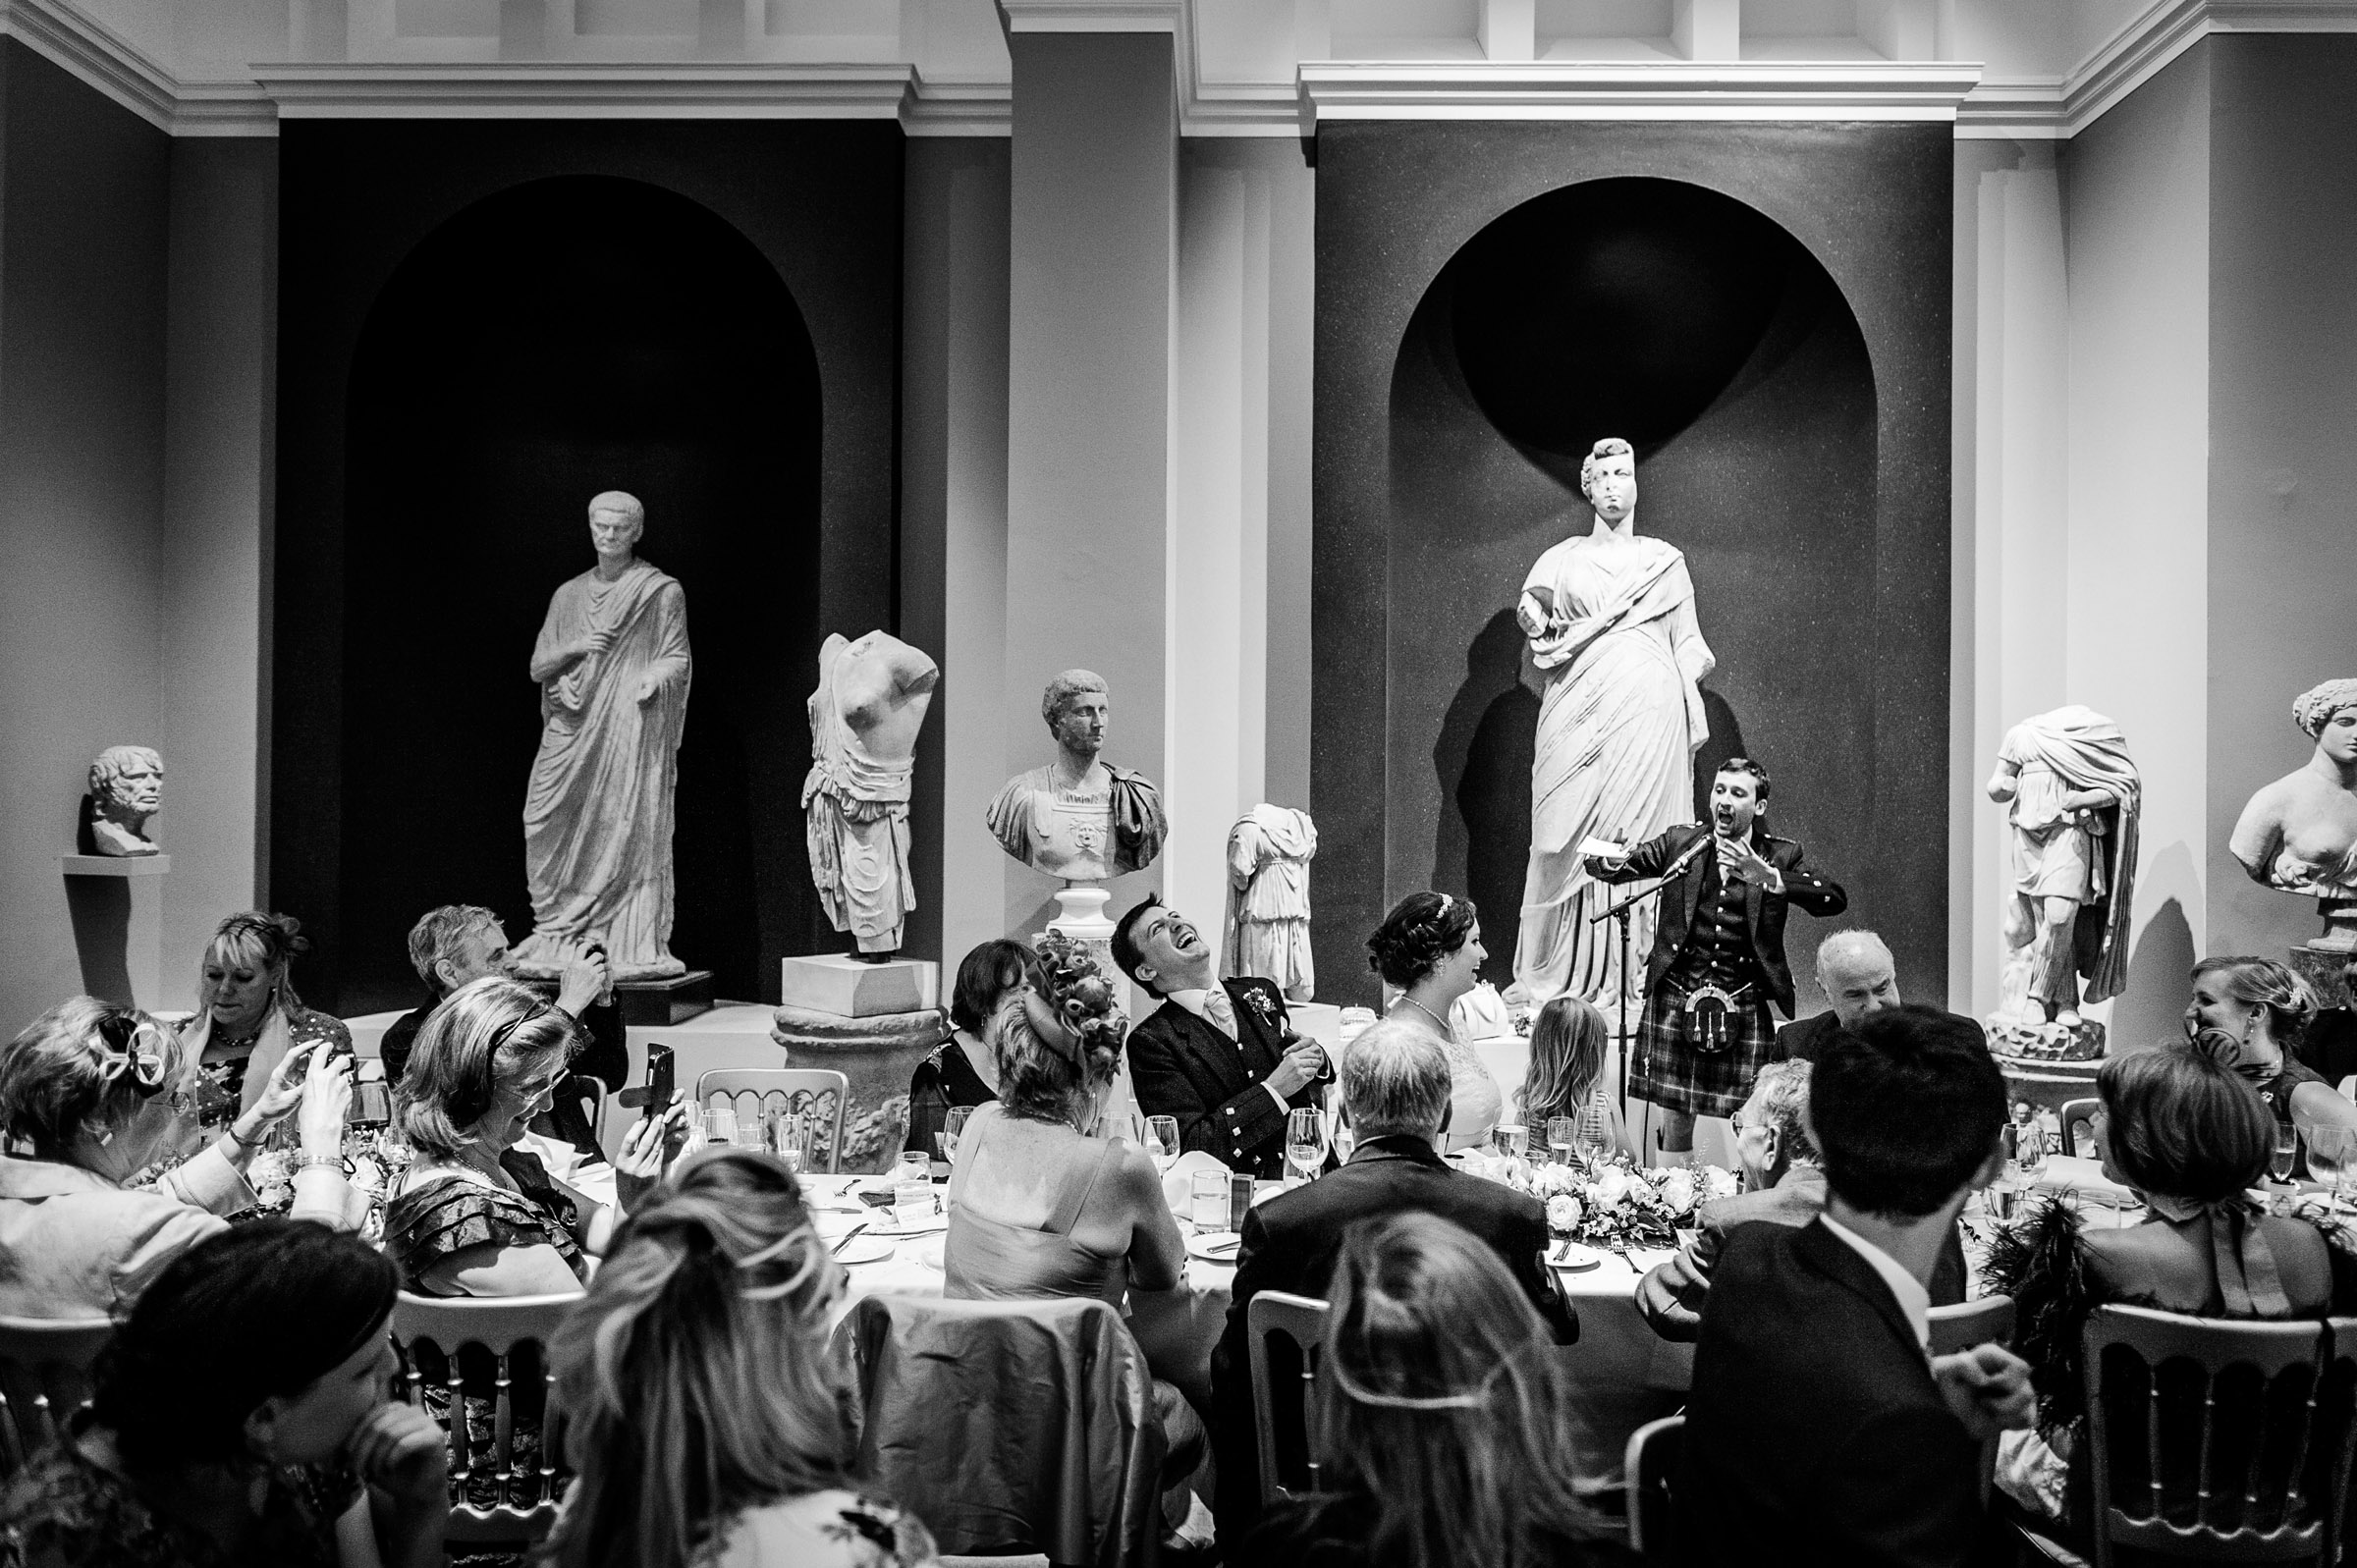 Ashmolean-Museum-Wedding-Pictures-0060.jpg